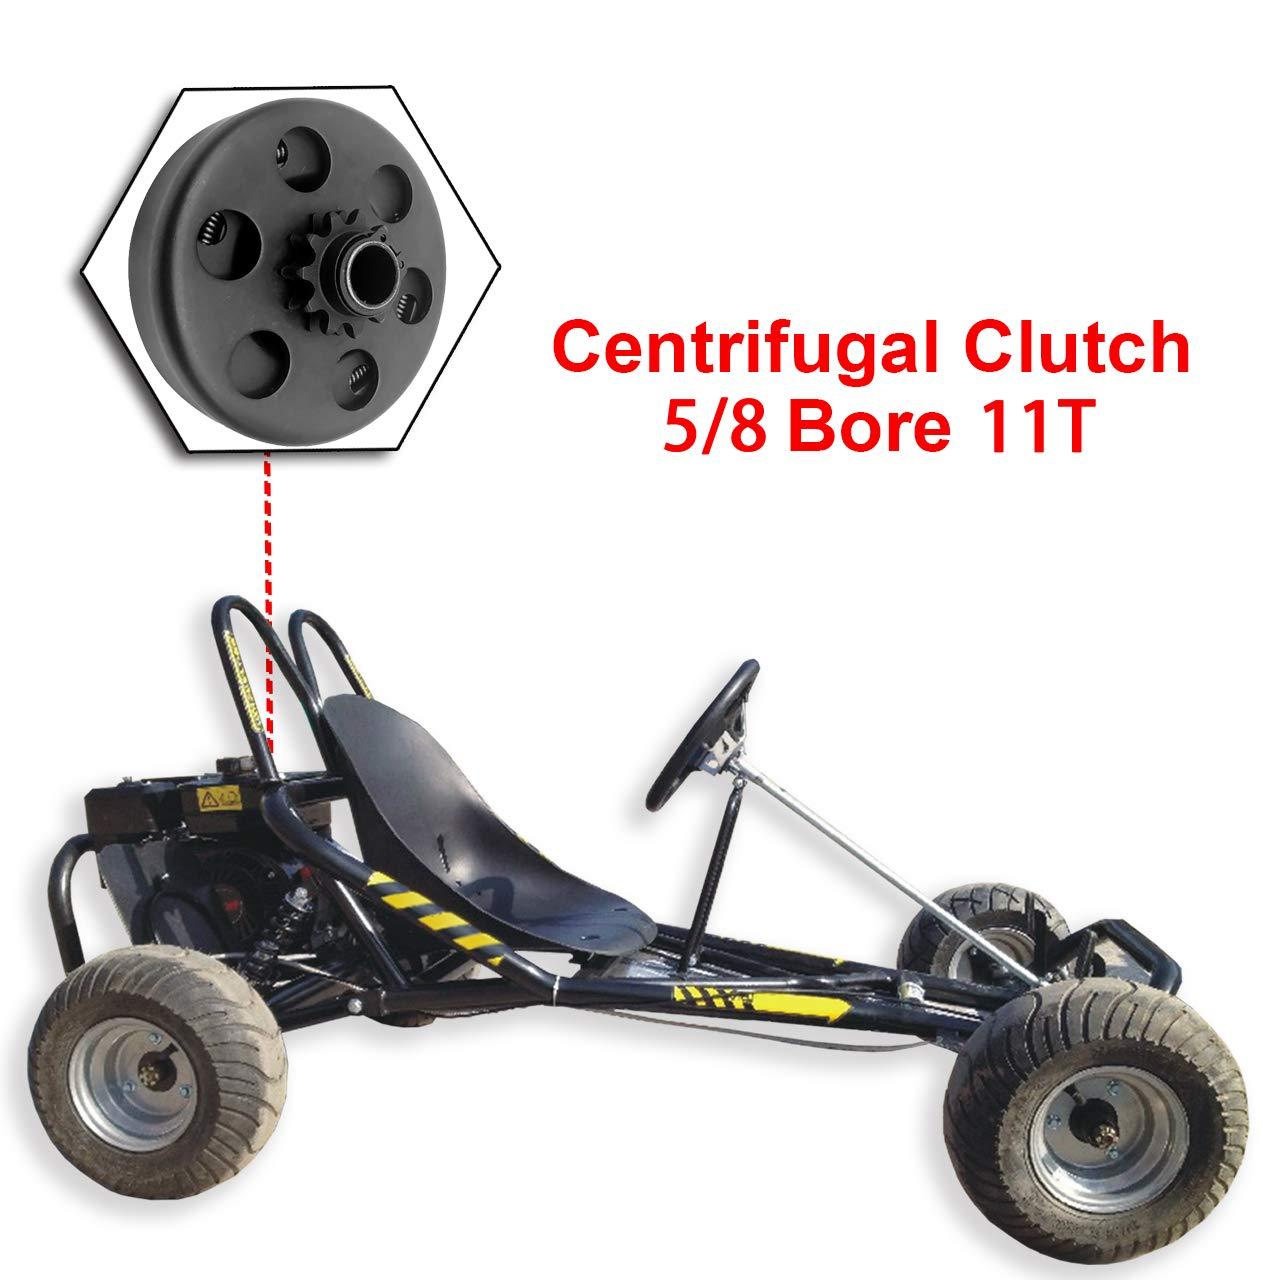 DEDC 1pcs Embrague Centr/ífugo 5//8 Embrague de Kart 11T para Go-karts Mini Bicicletas Motocicletas Equipos de Jardiner/ía Bombas